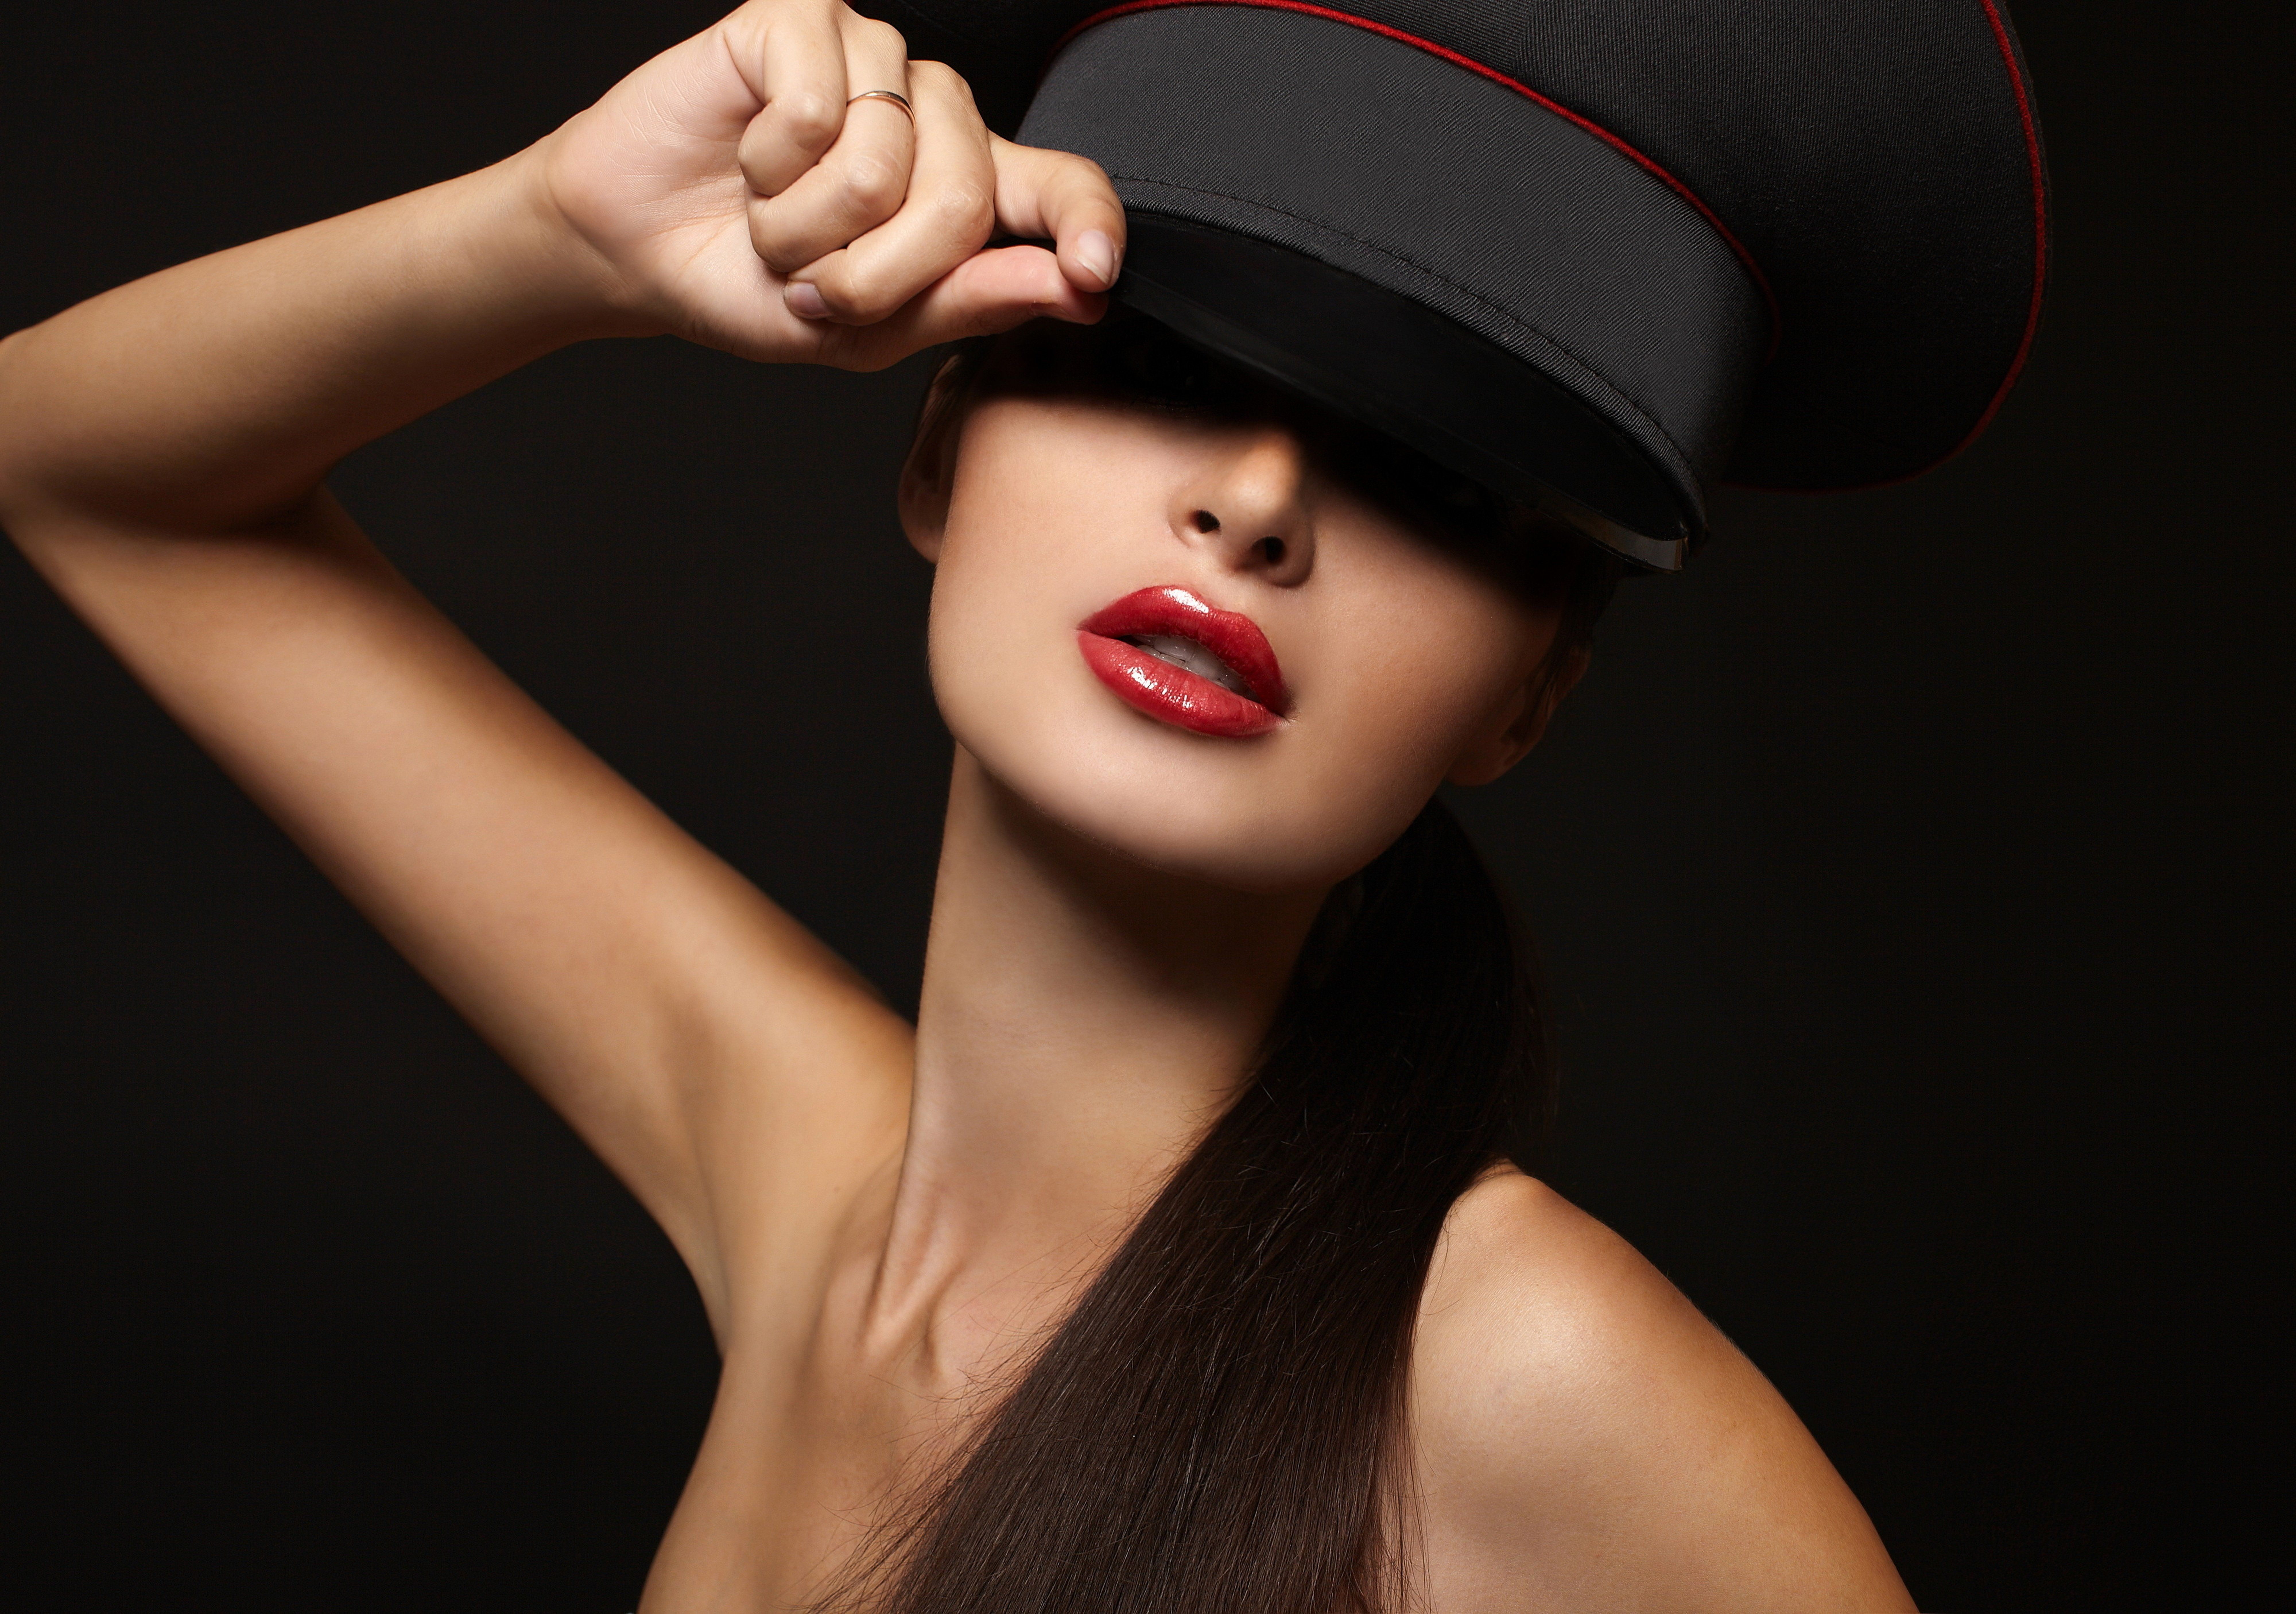 Girl Model Red Lips Lipstick Face Hand Hair Shoulders Black